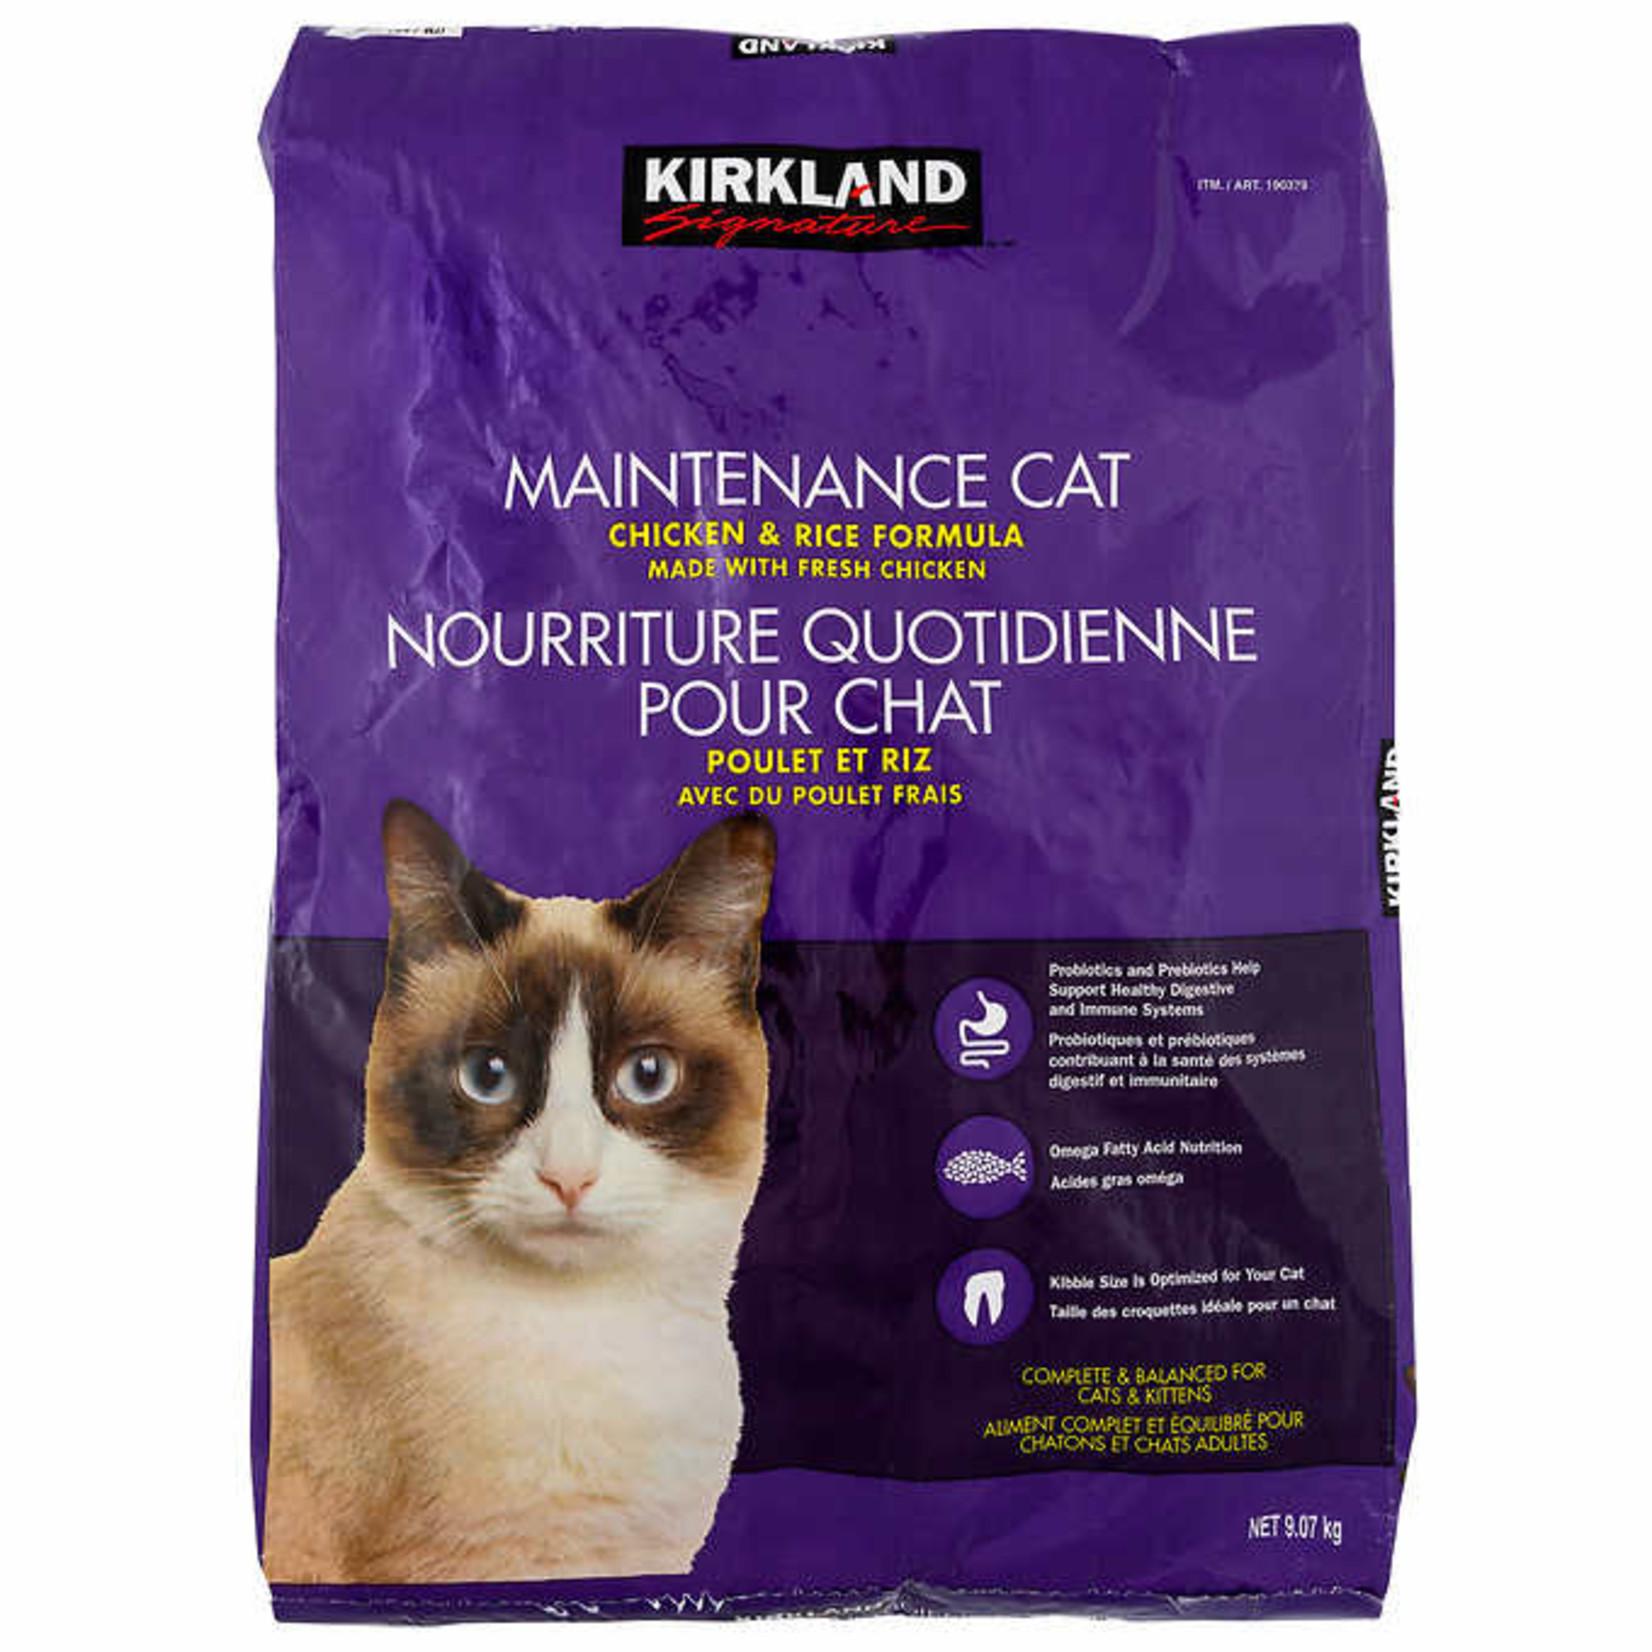 Kirkland Signature Maintenance Chicken & Rice Formula Cat Food 9.07kg